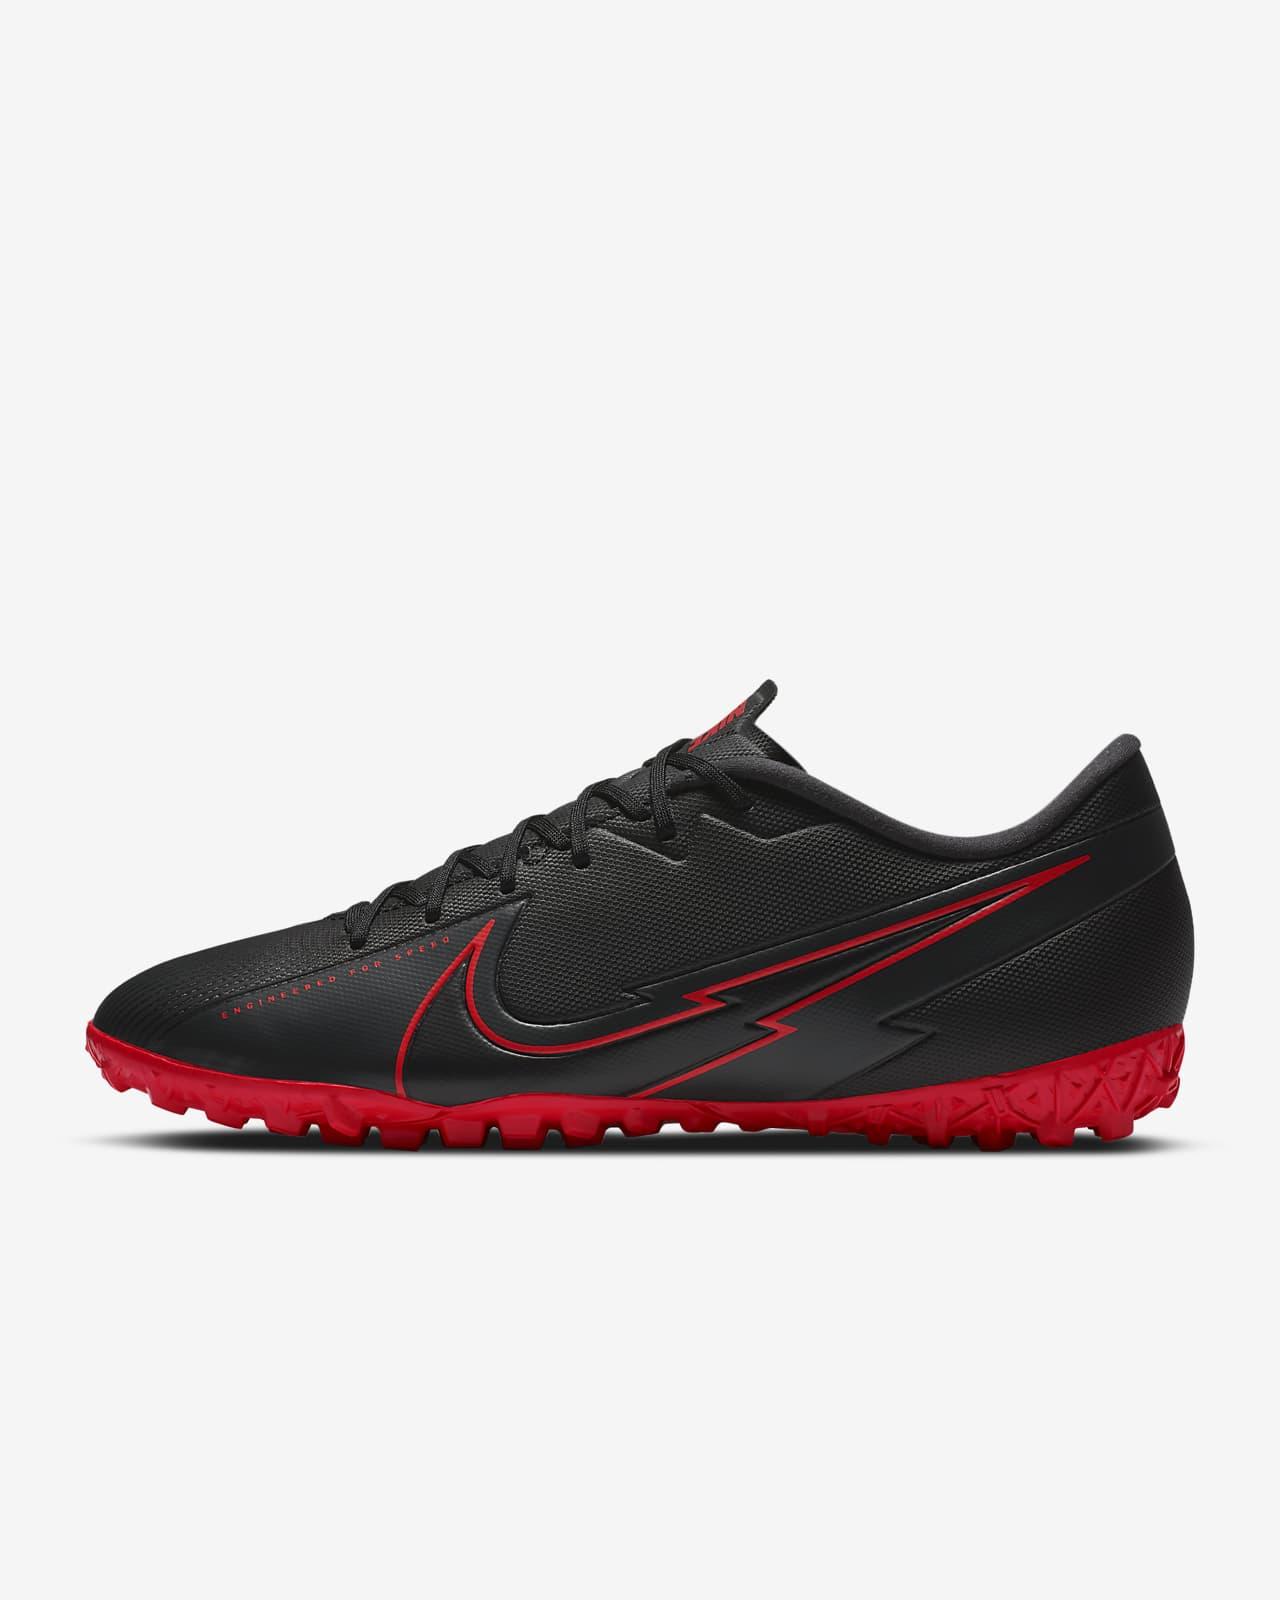 Nike Mercurial Vapor 13 Academy TF Turf Soccer Shoes. Nike JP